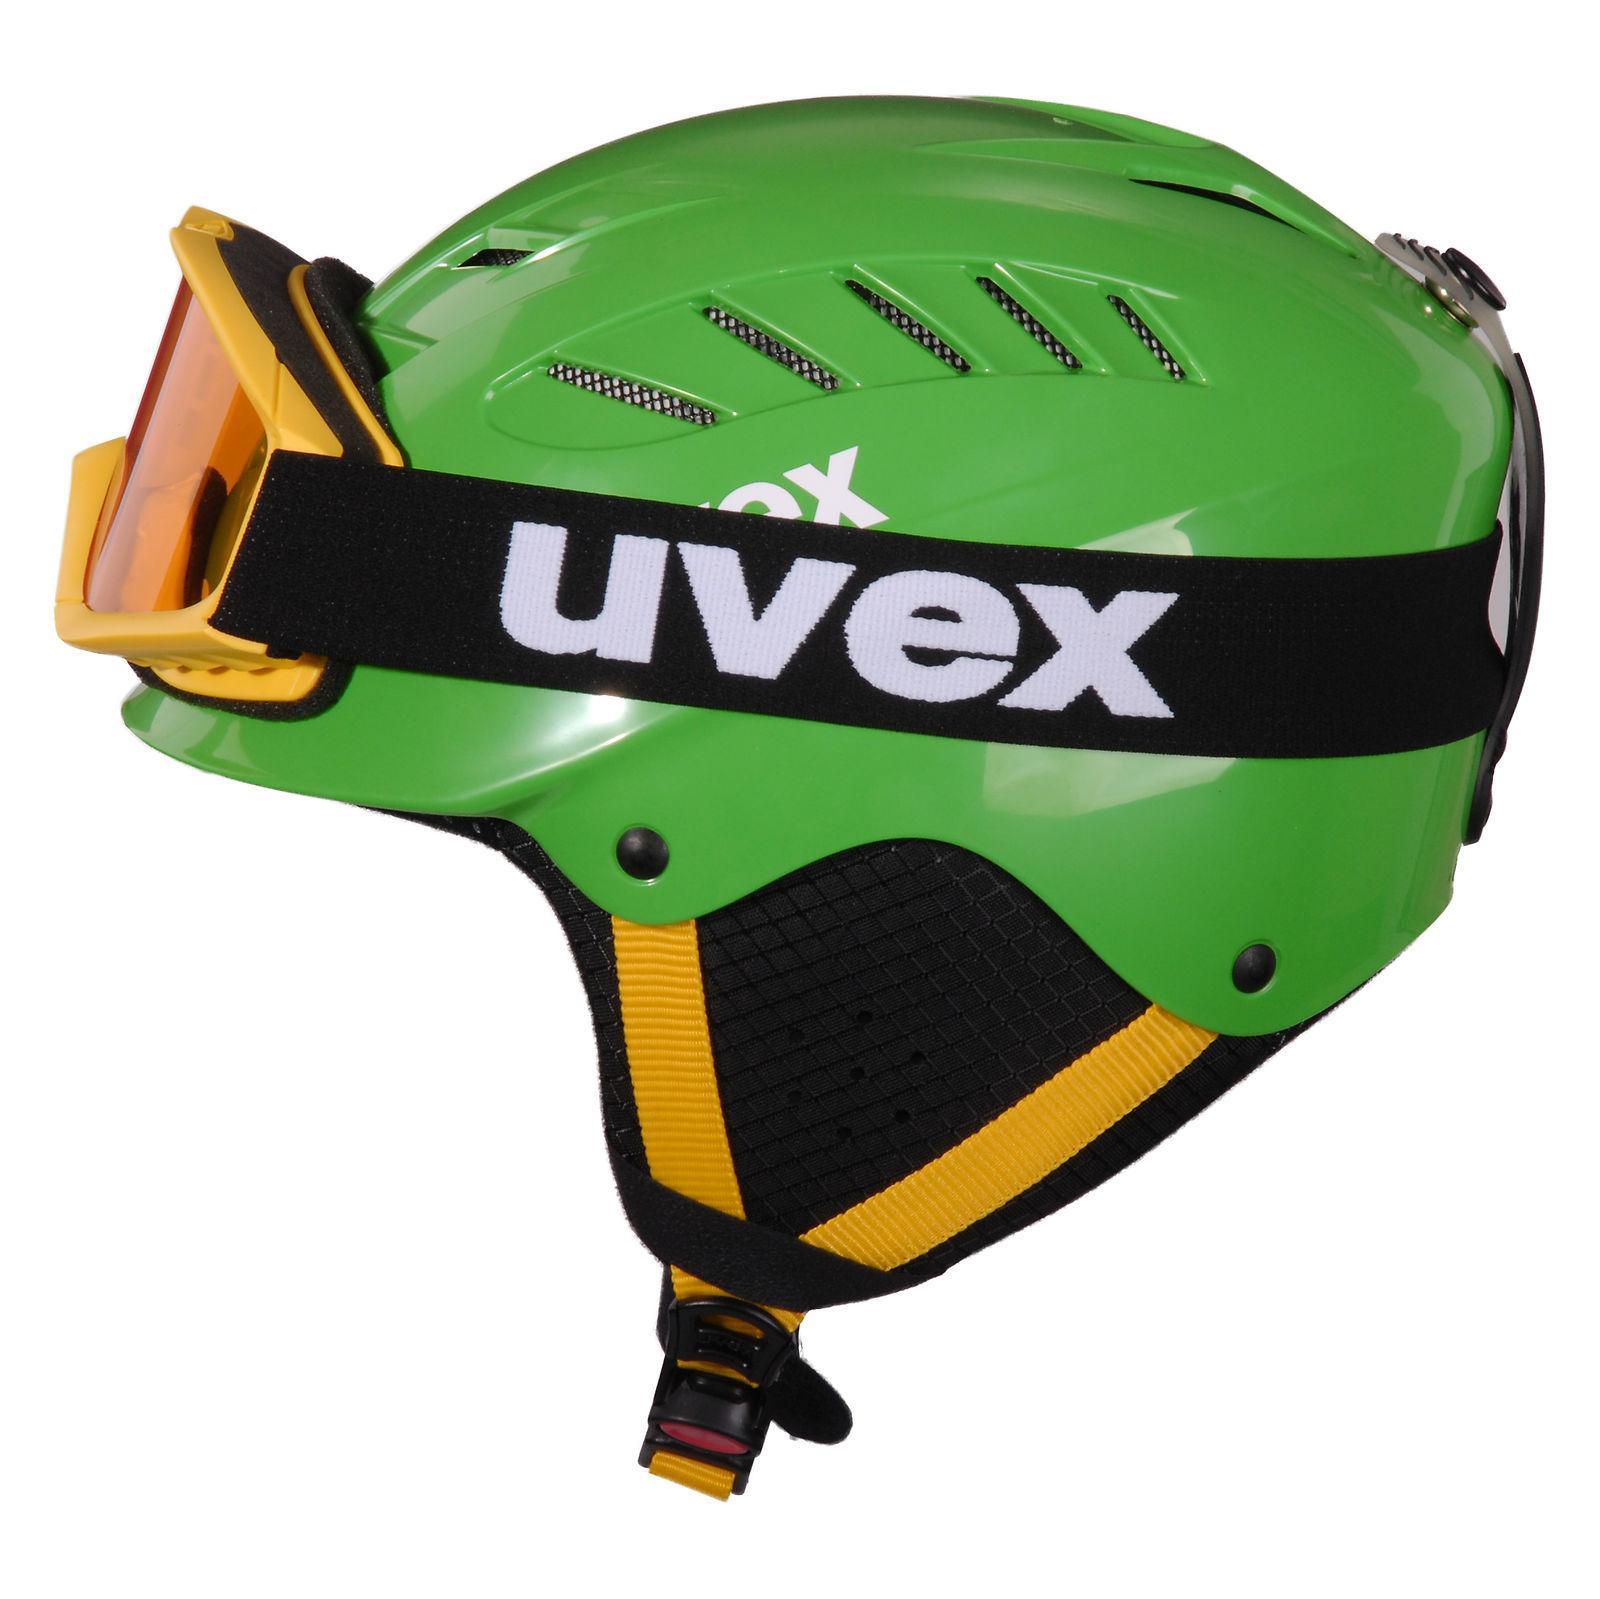 Kask Uvex X-Ride Jr.set 56S169